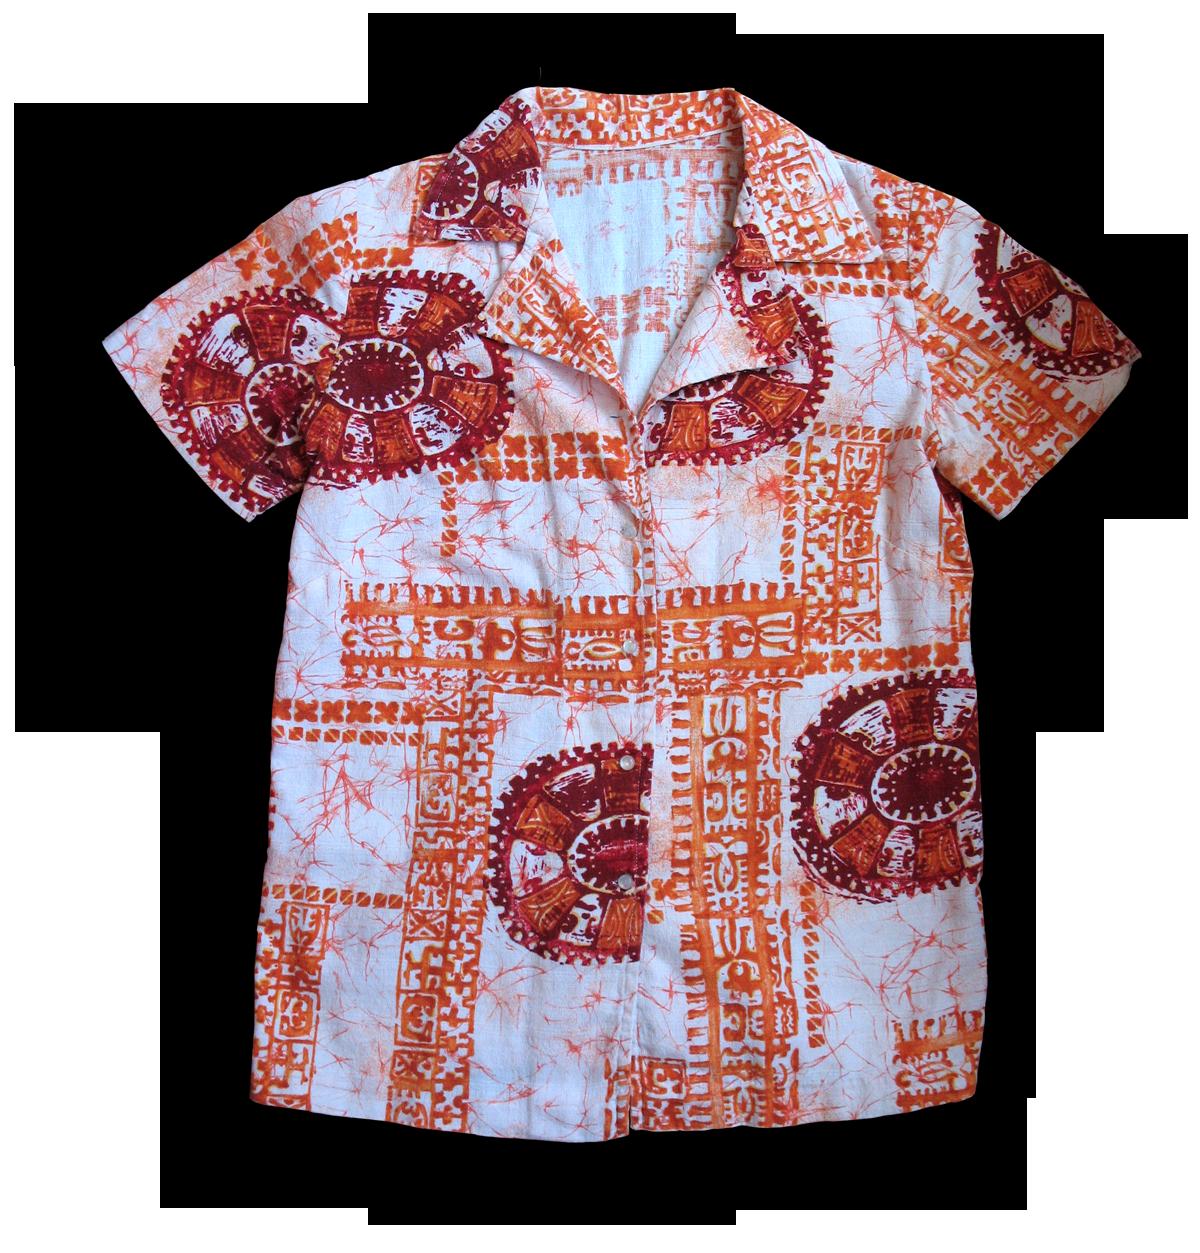 Aloha shirt - Wikipedia